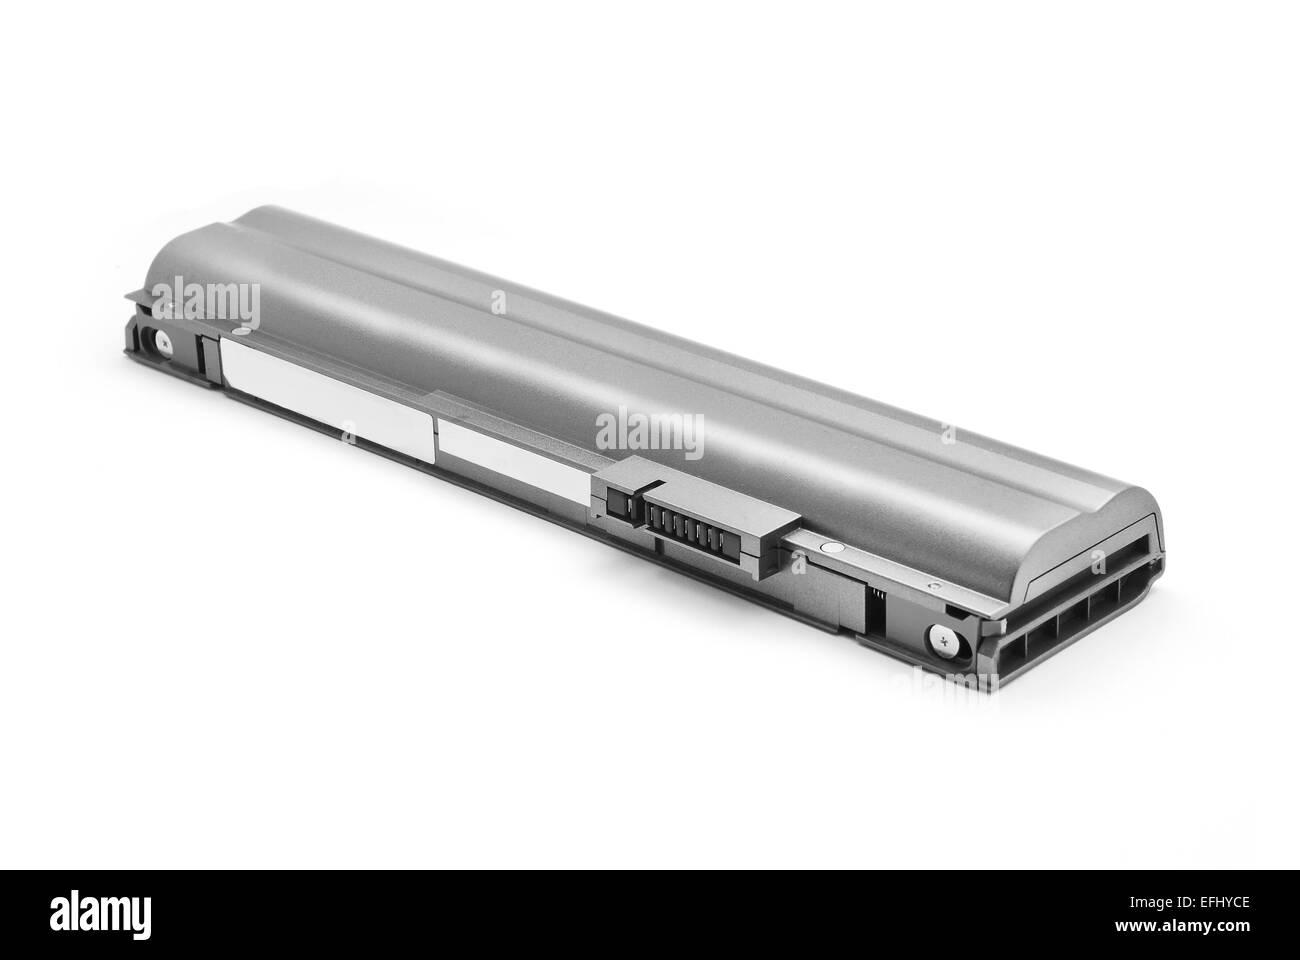 laptop battery on white background - Stock Image